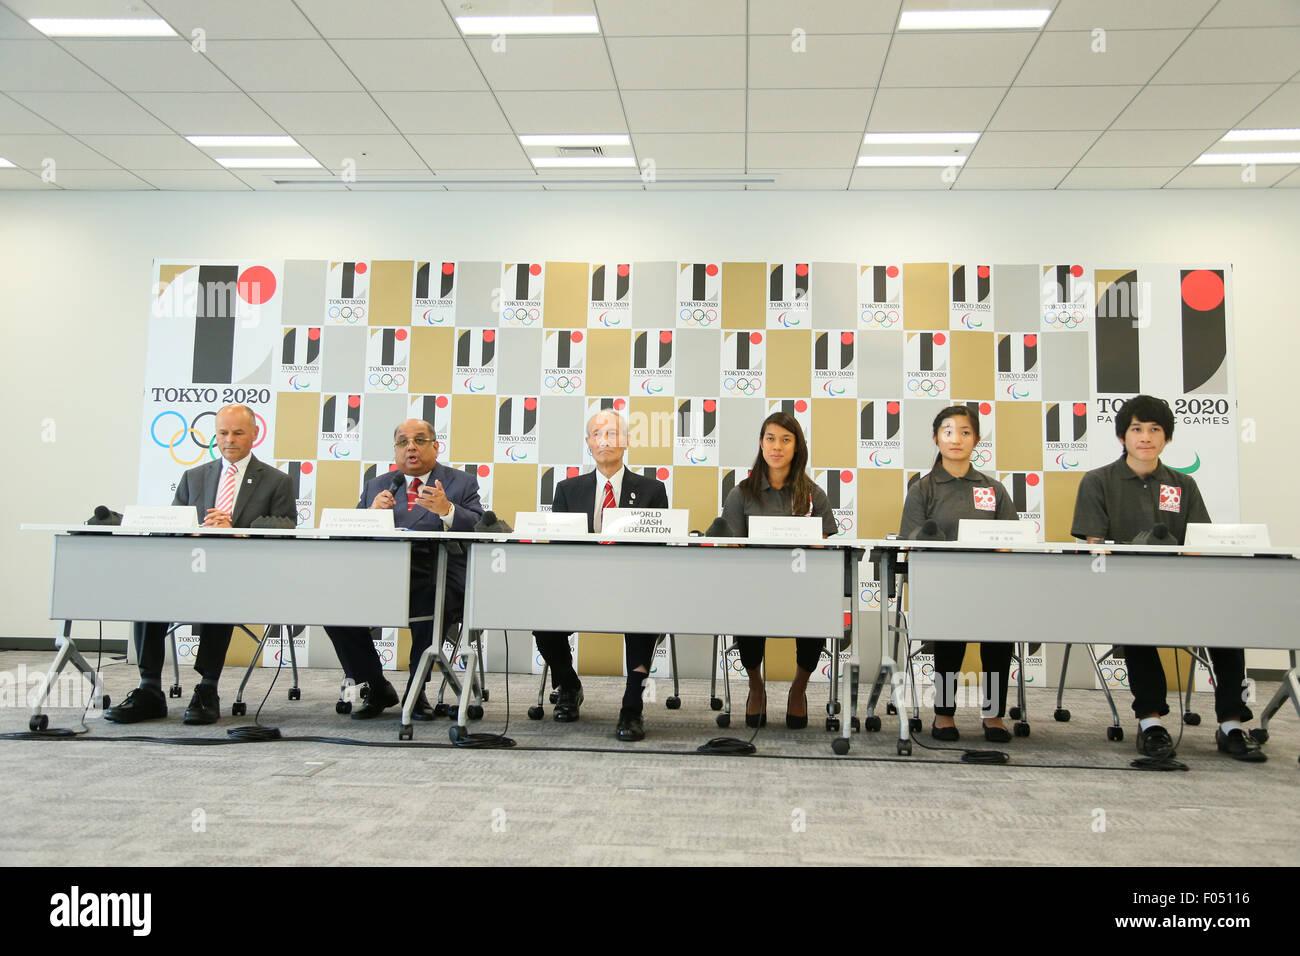 (L to R) Andrew Shelley, Narayana Ramachandran, Kazuya Kasahara, Nicol David, Satomi Watanabe, Ryunosuke Tsukue, - Stock Image